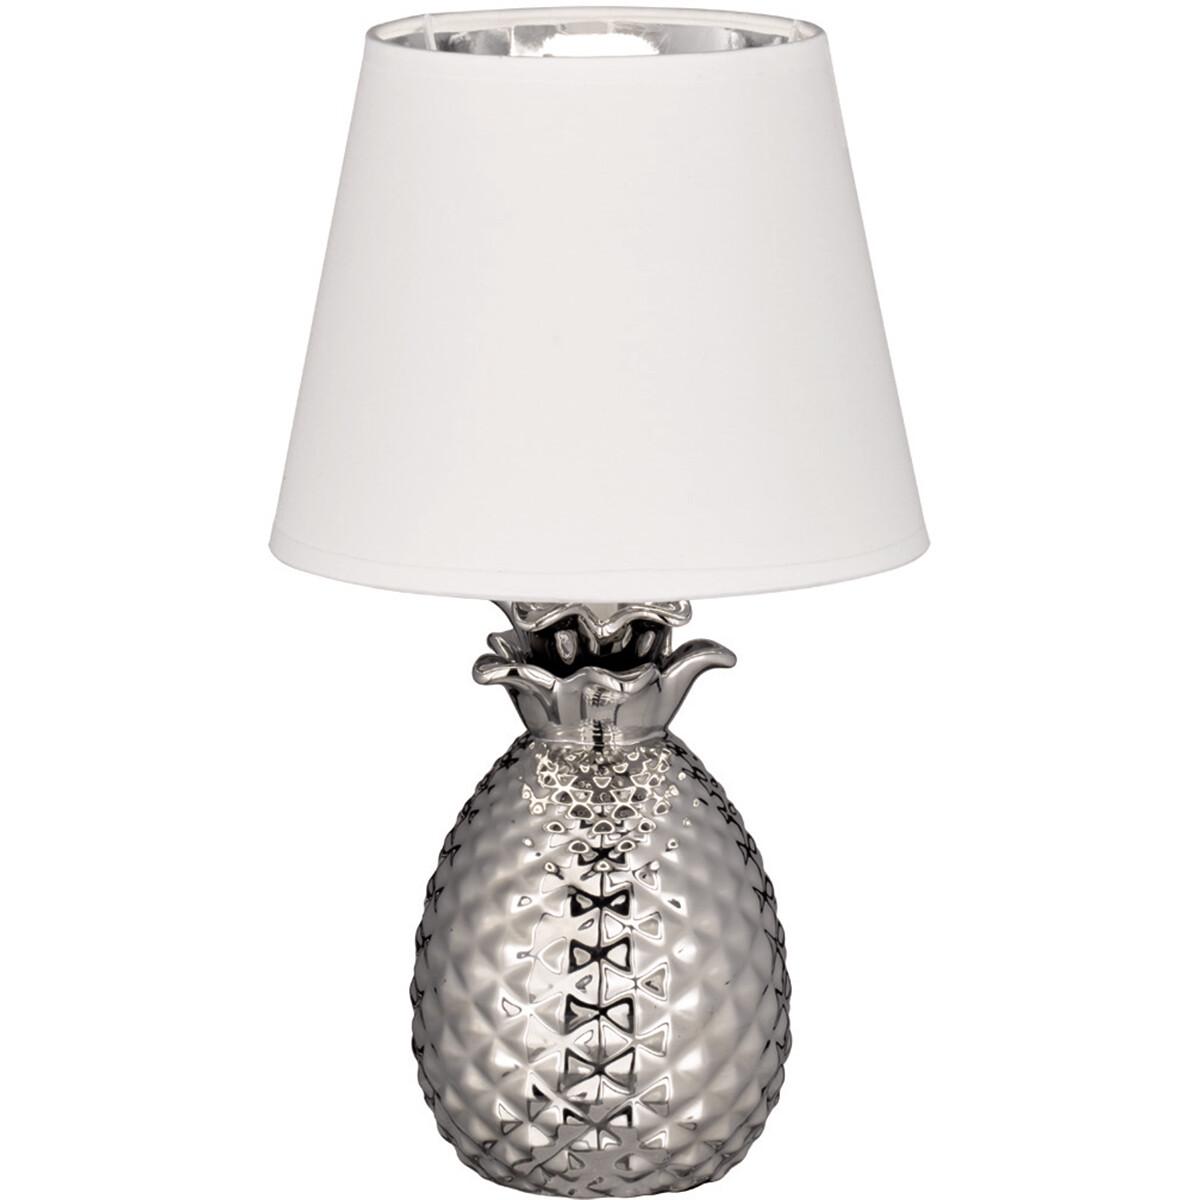 LED Tafellamp - Tafelverlichting - Trion Pinaply - E14 Fitting - Rond - Mat Zilver - Keramiek